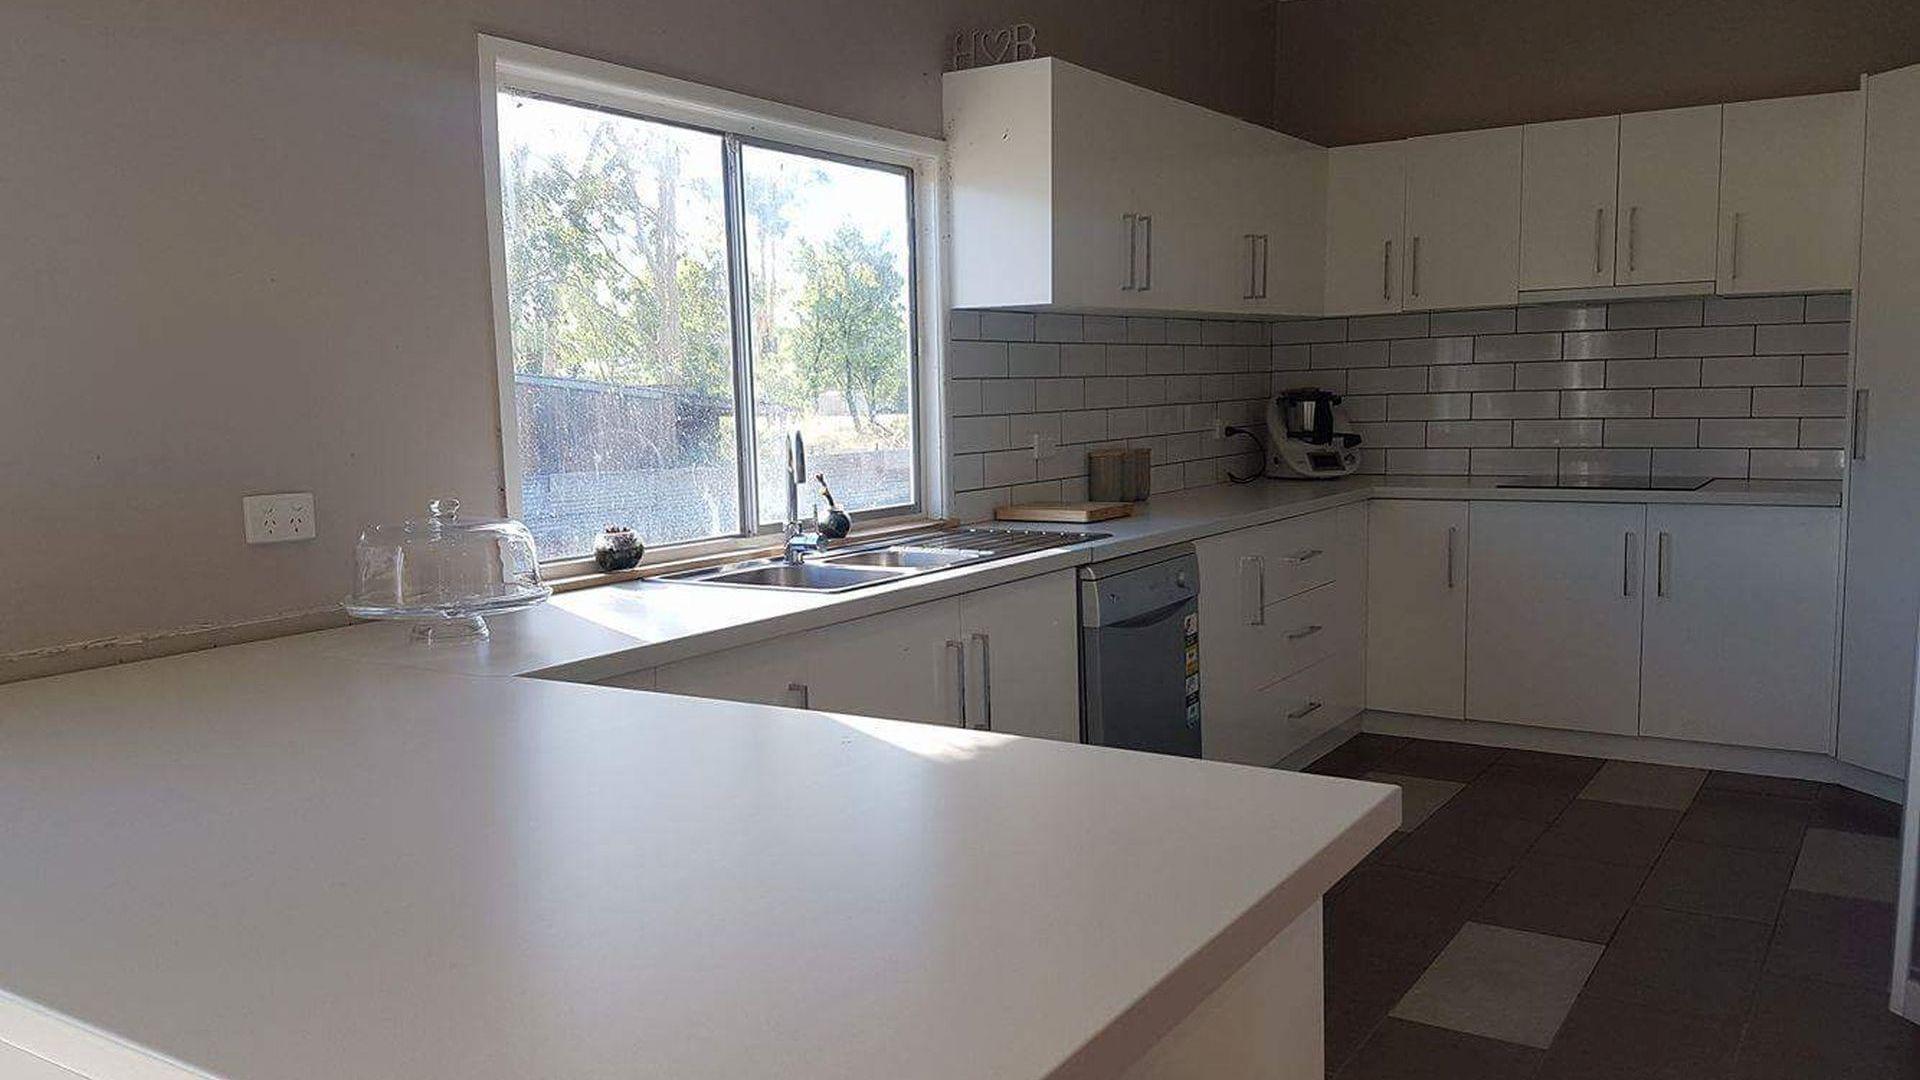 4-6 Hilda Street, Charleville QLD 4470, Image 1